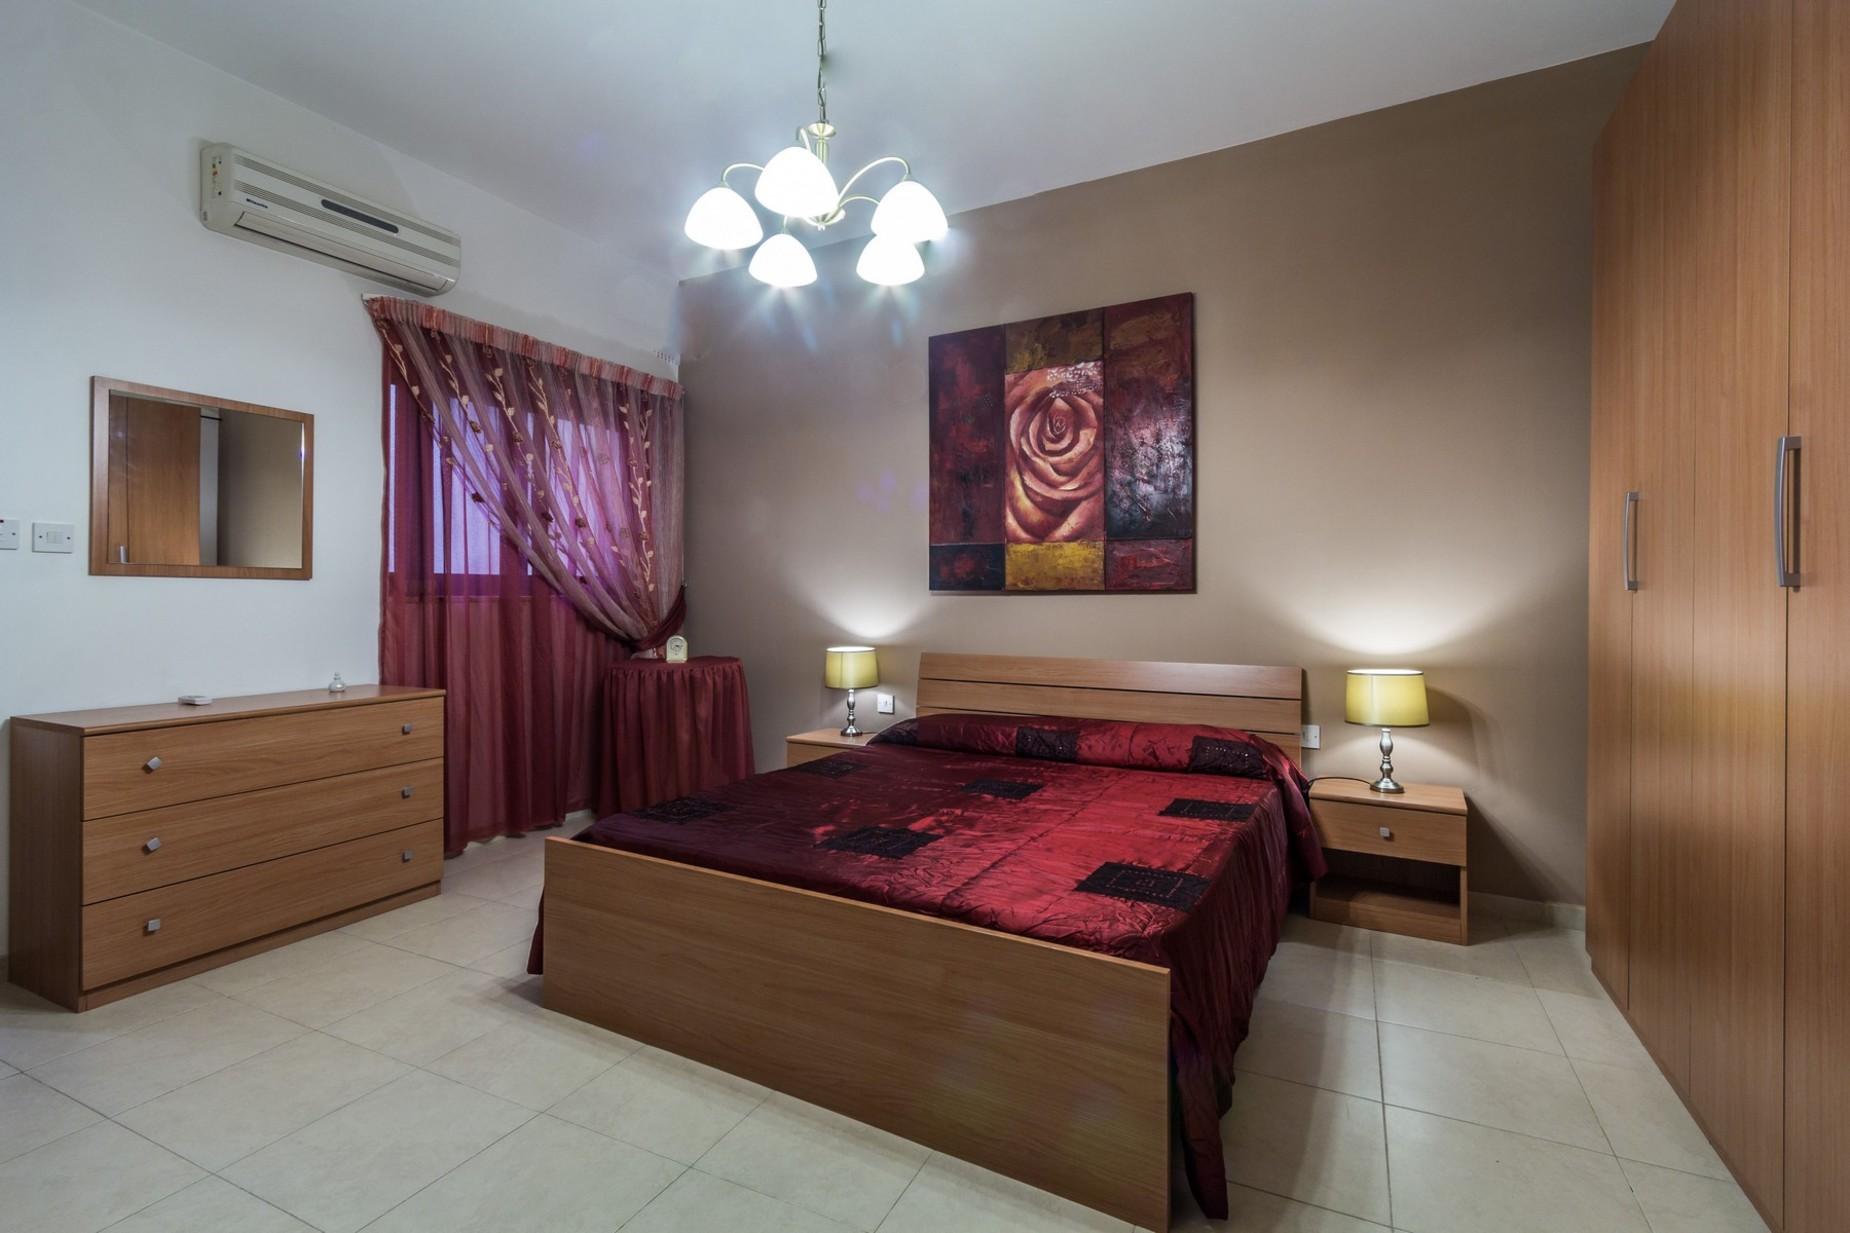 3 bed Apartment For Sale in Qawra, Qawra - thumb 8